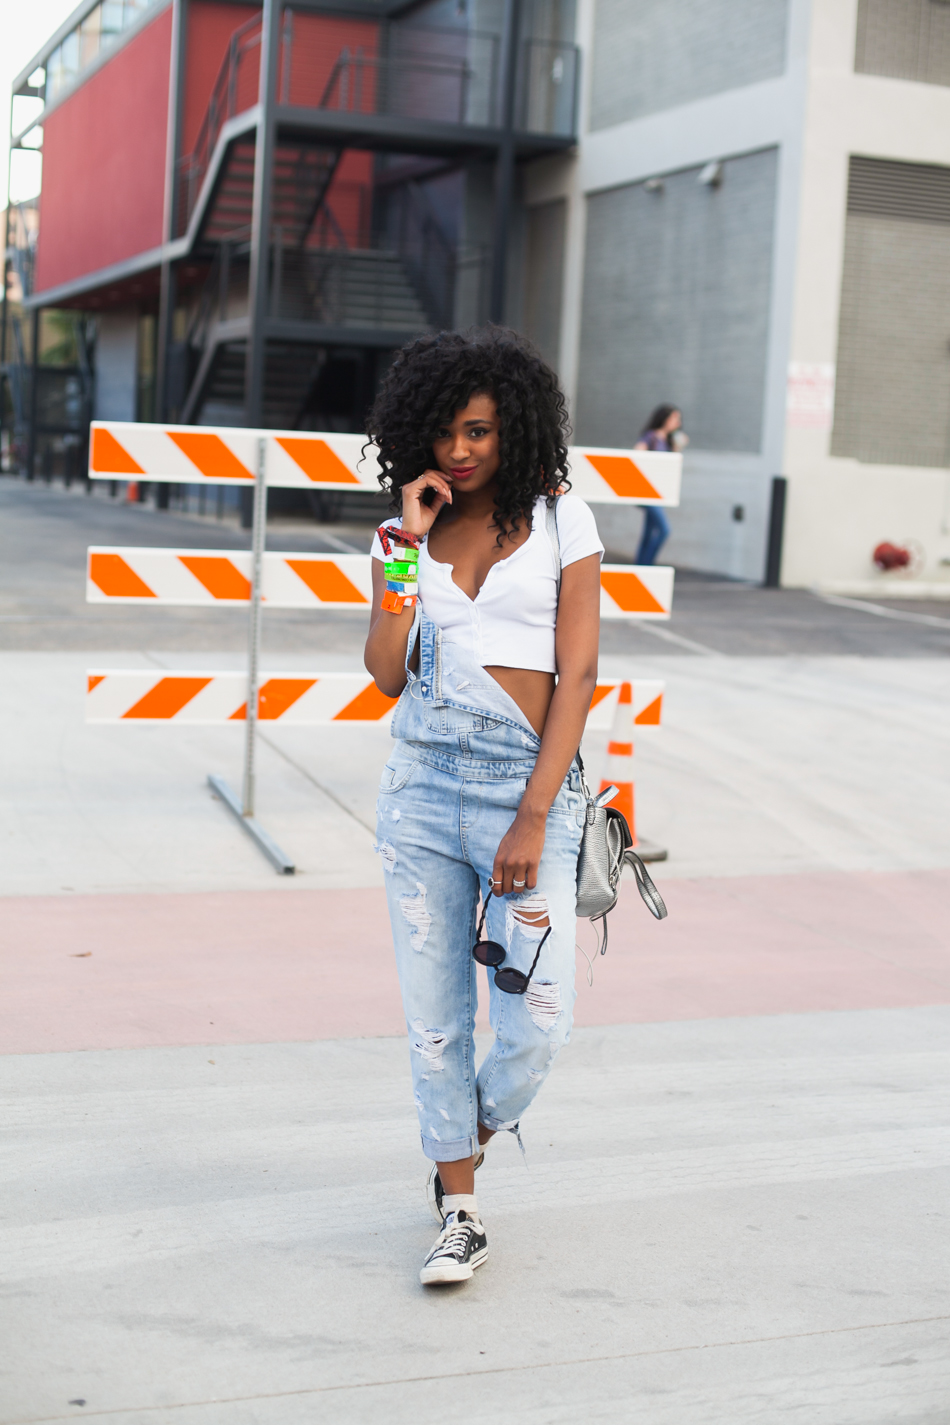 zara-overalls-sxsw-austin-texas-blogger